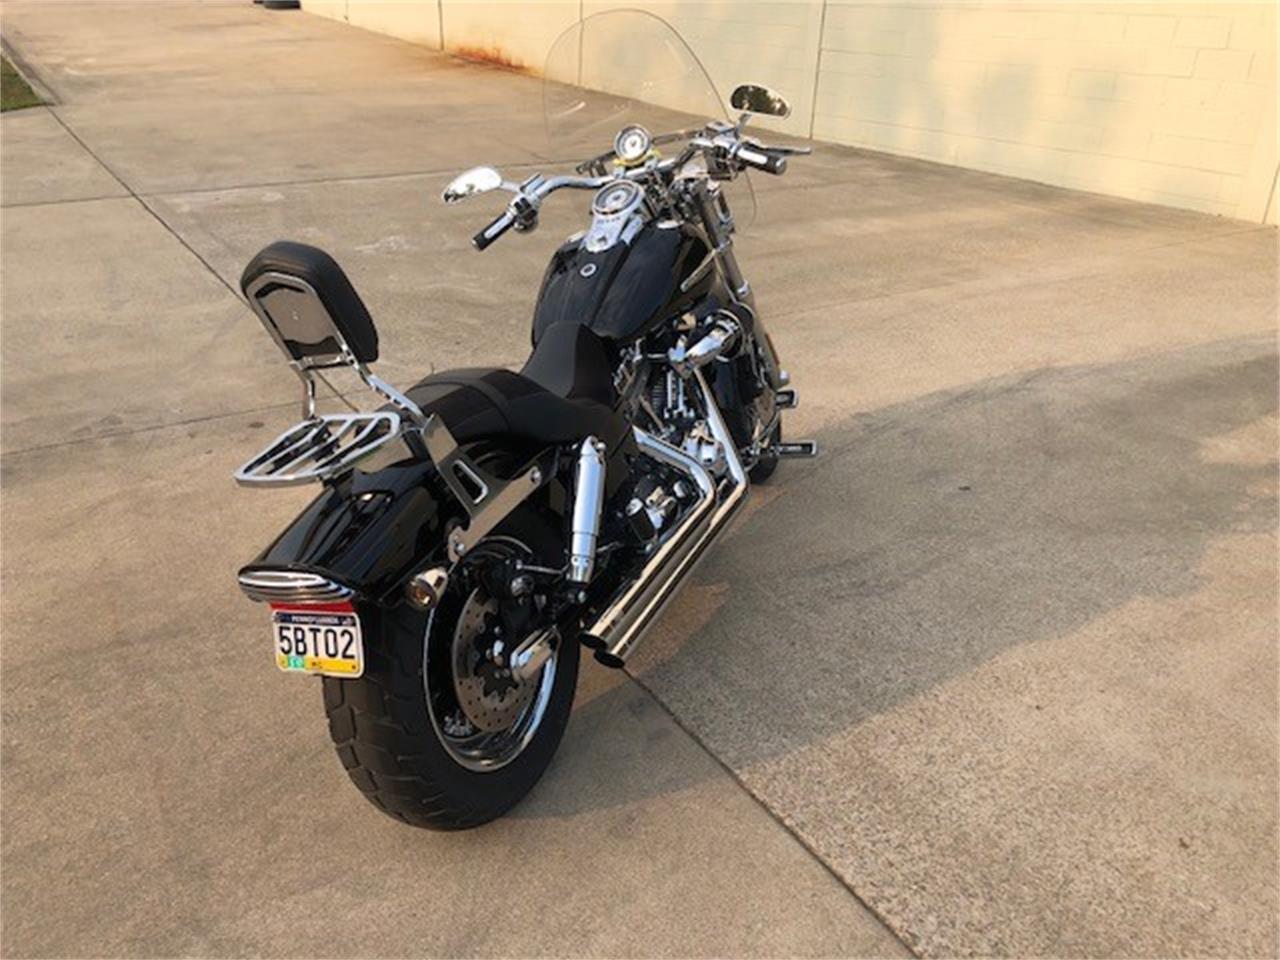 2009 Harley-Davidson Motorcycle (CC-1263503) for sale in Washington, Pennsylvania